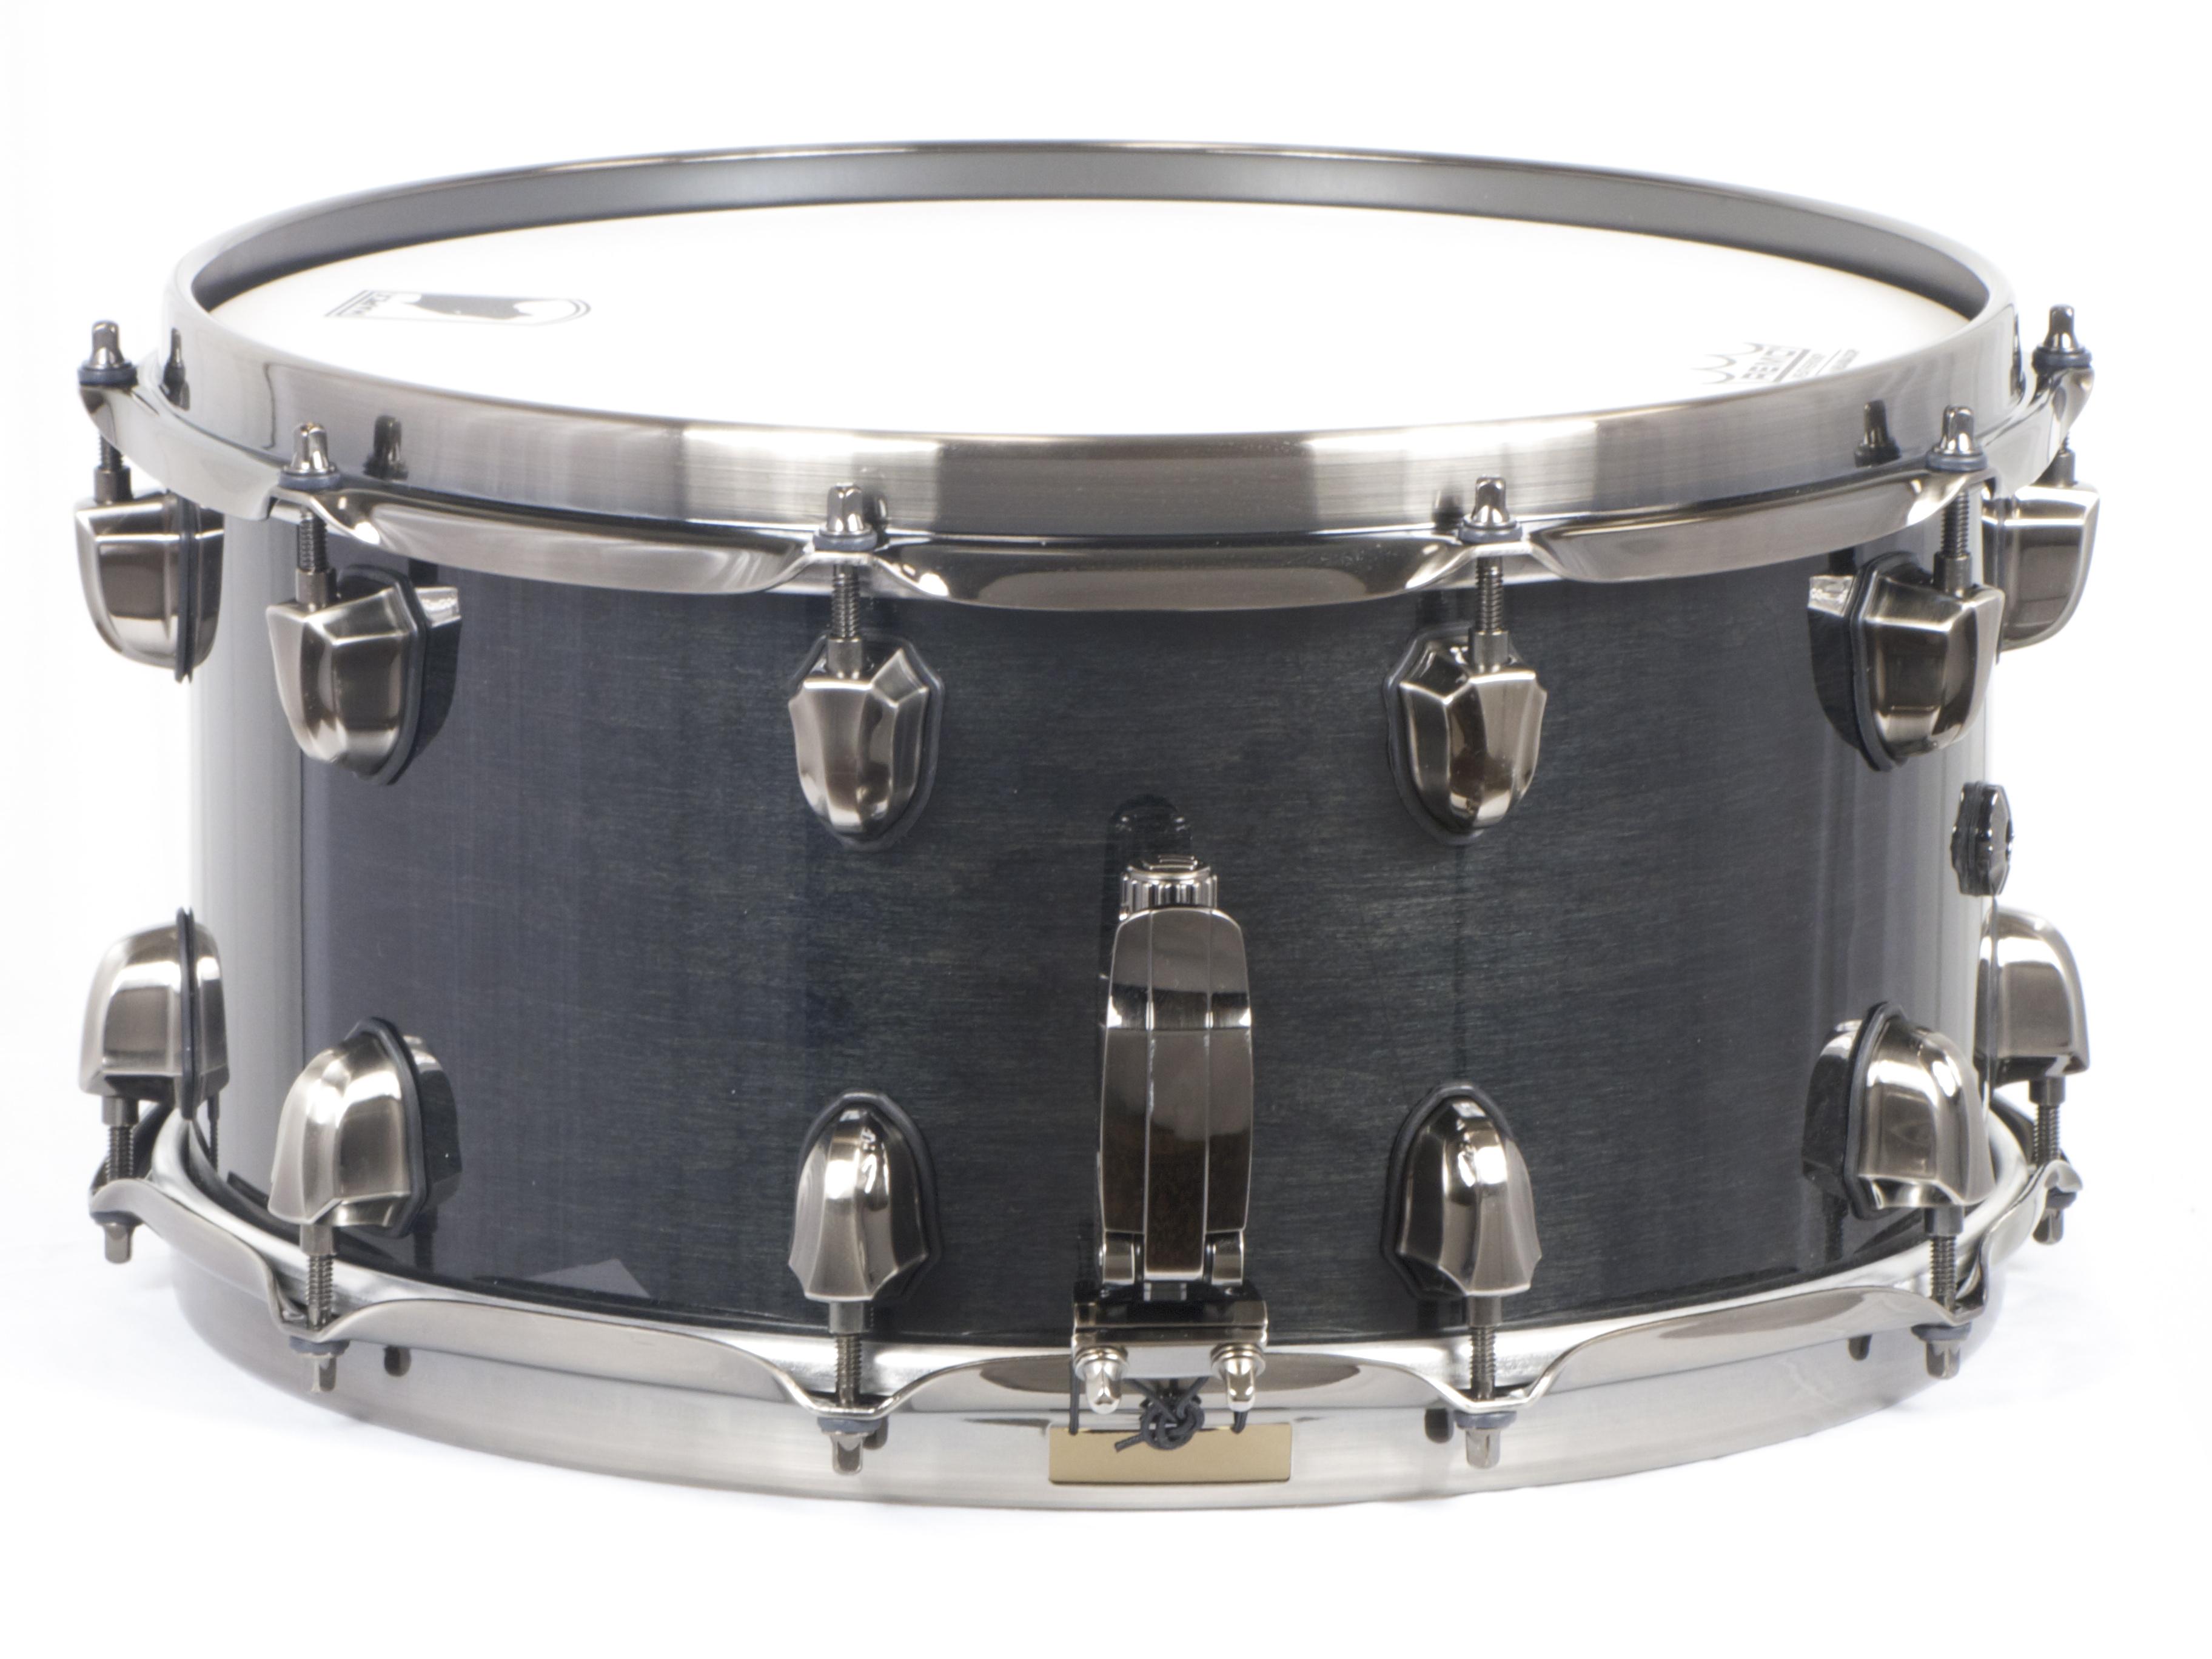 Mapex Black Panther Phatbob 7x14 Snare Drum Ebay